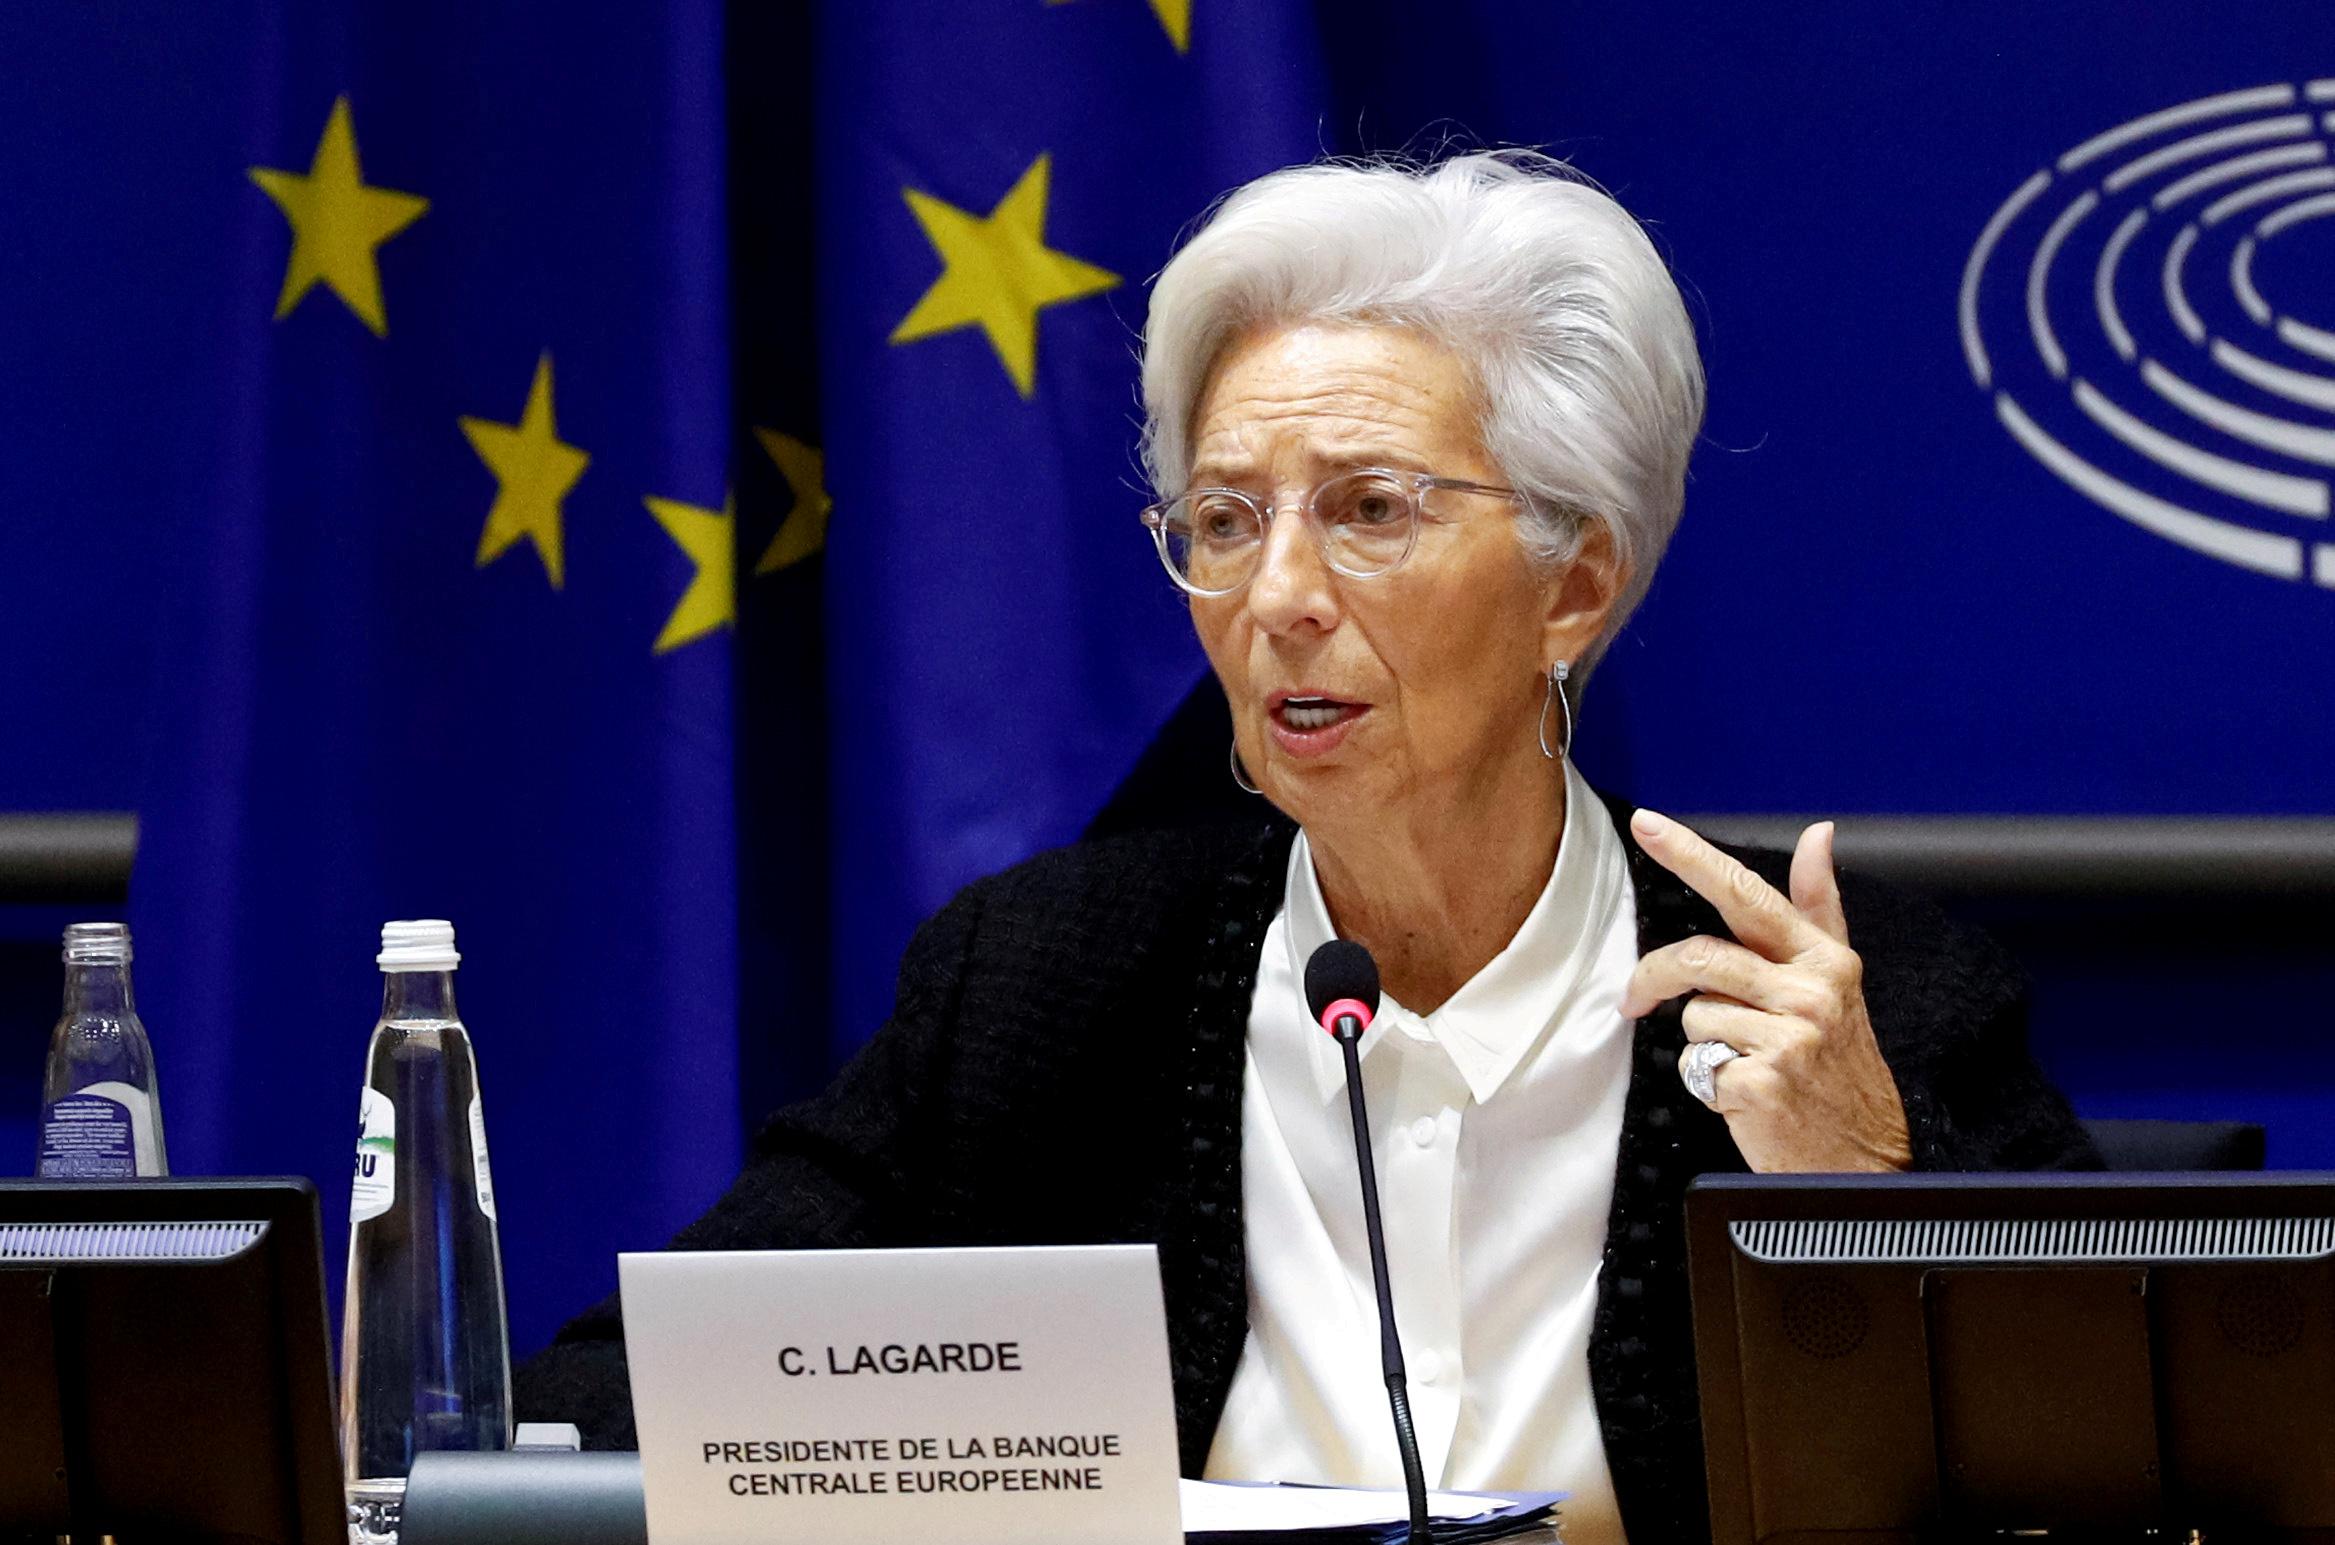 European Central bank president calls crypto suspicious and speculative